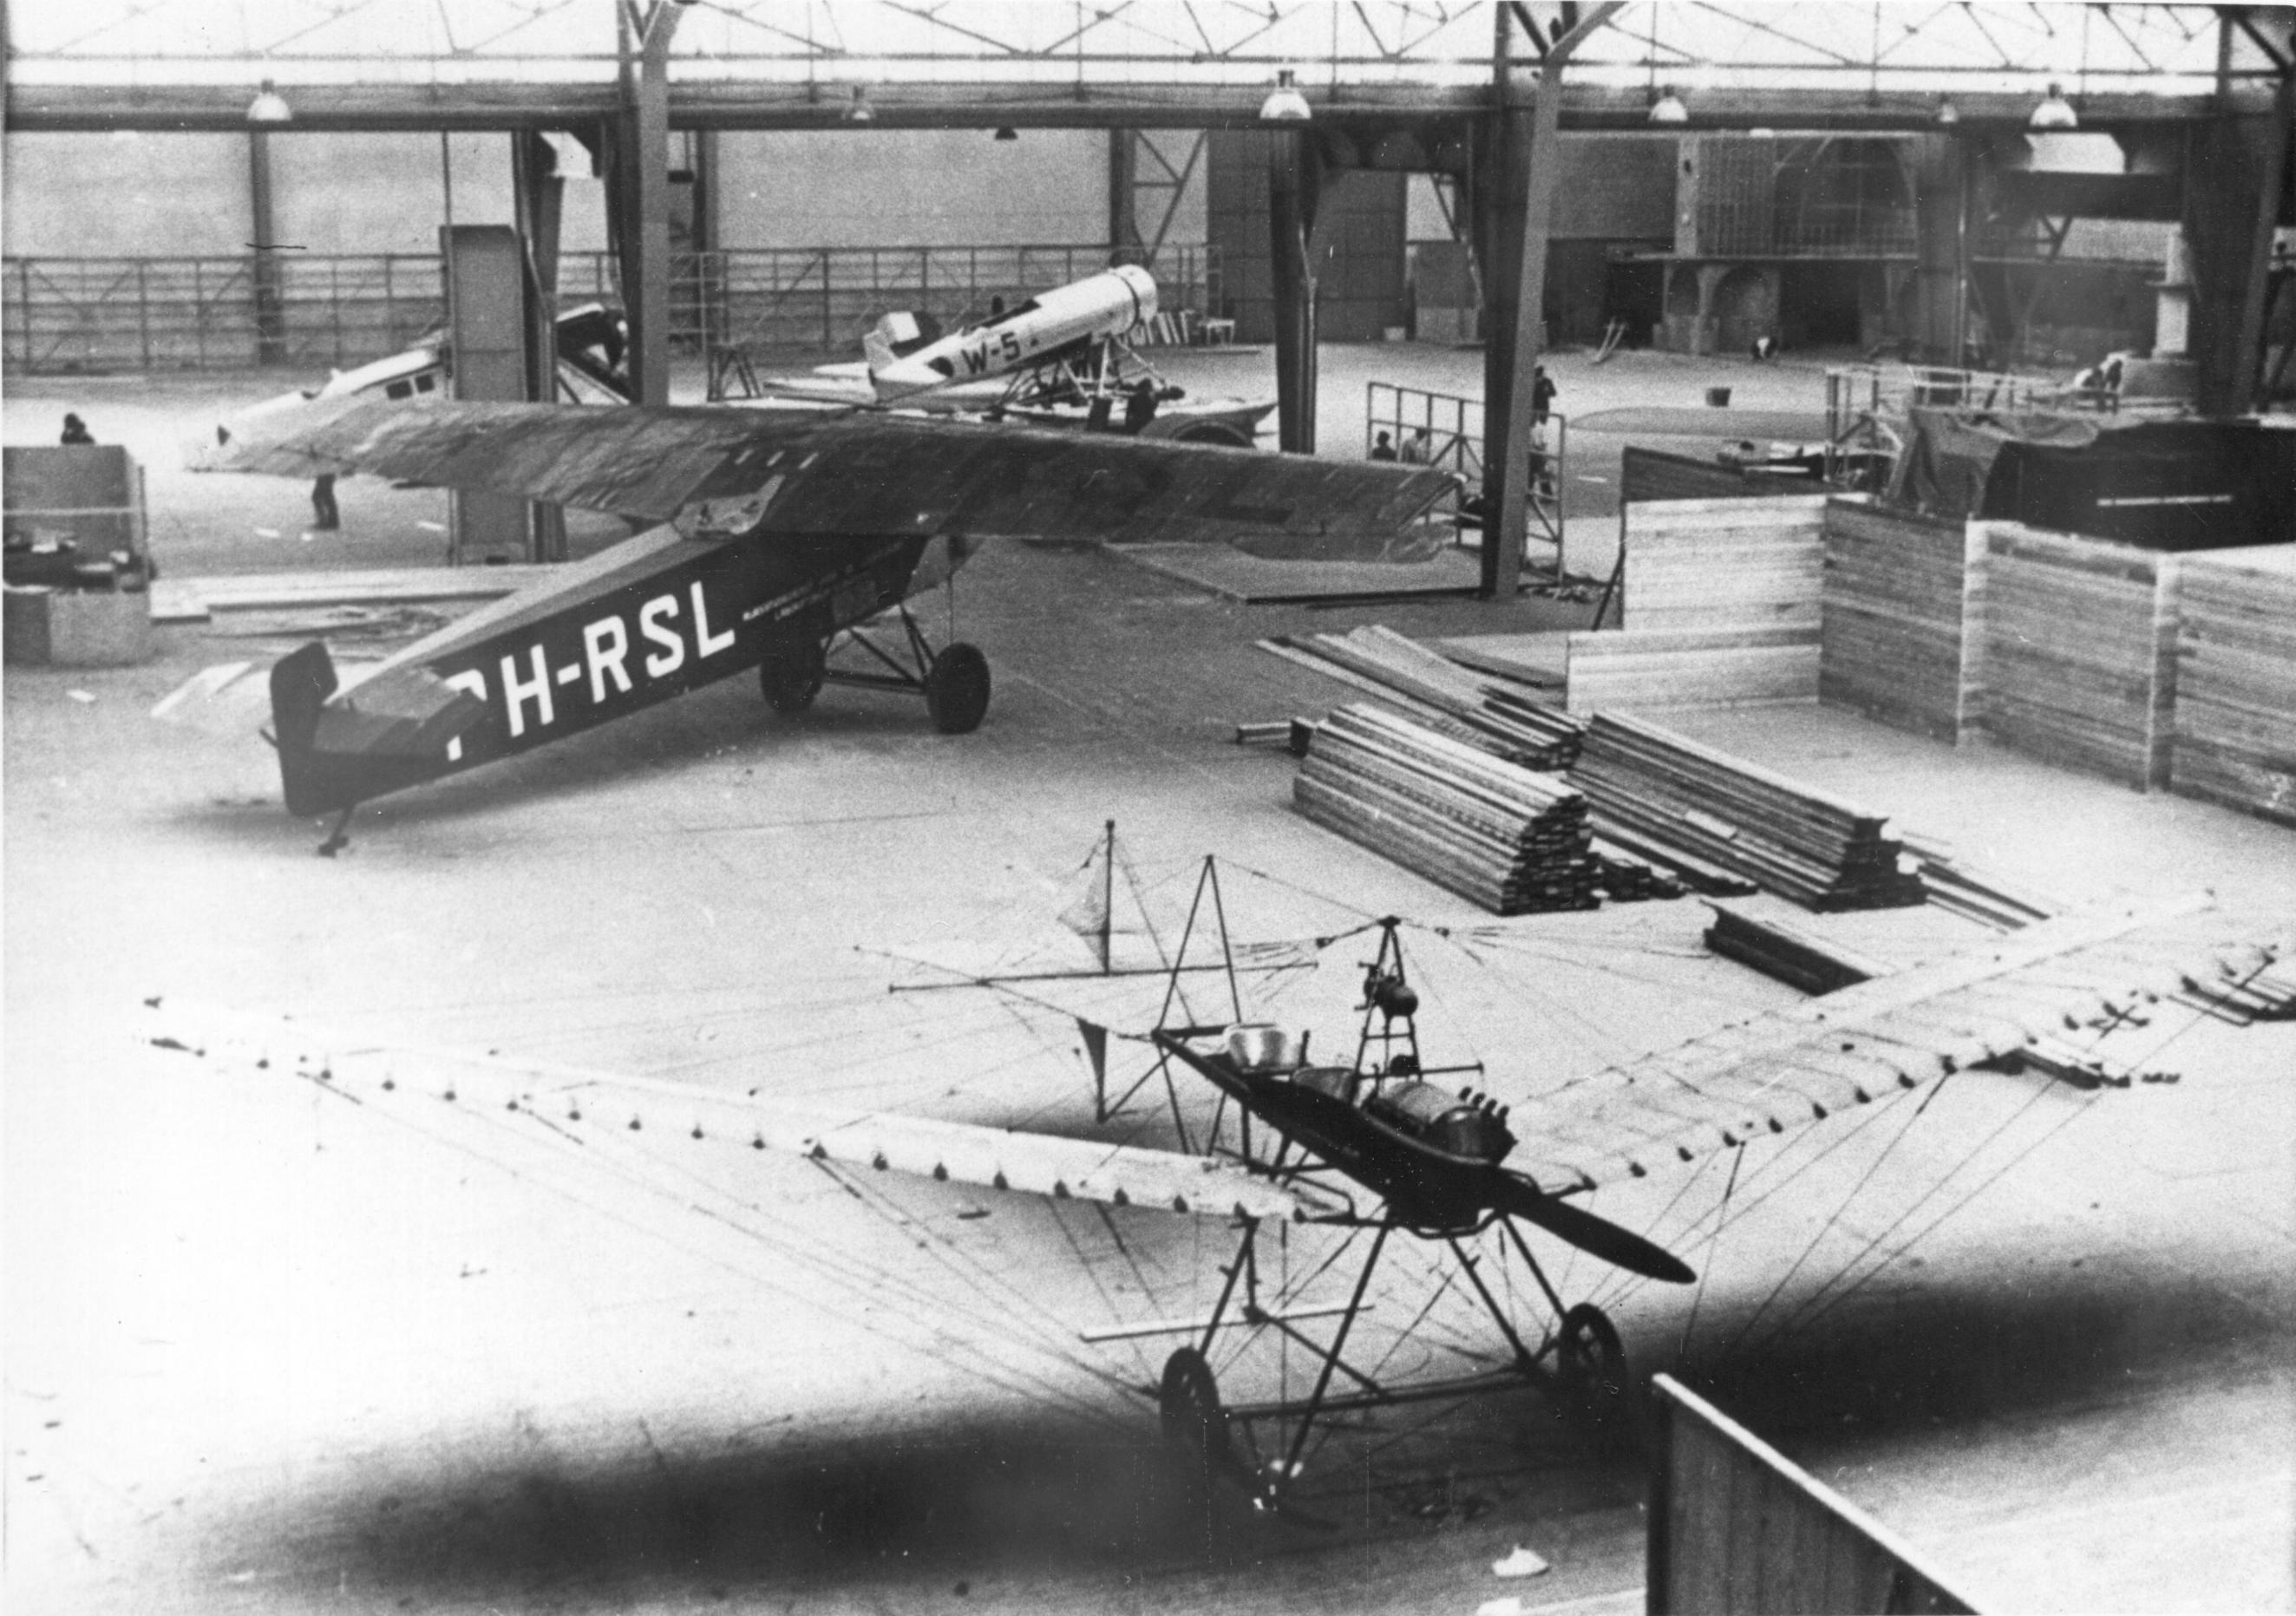 Naam: Schiphol 1939 FK26, C-11, F-7a, Spin via GJTORNIJ.jpg Bekeken: 116 Grootte: 515,8 KB